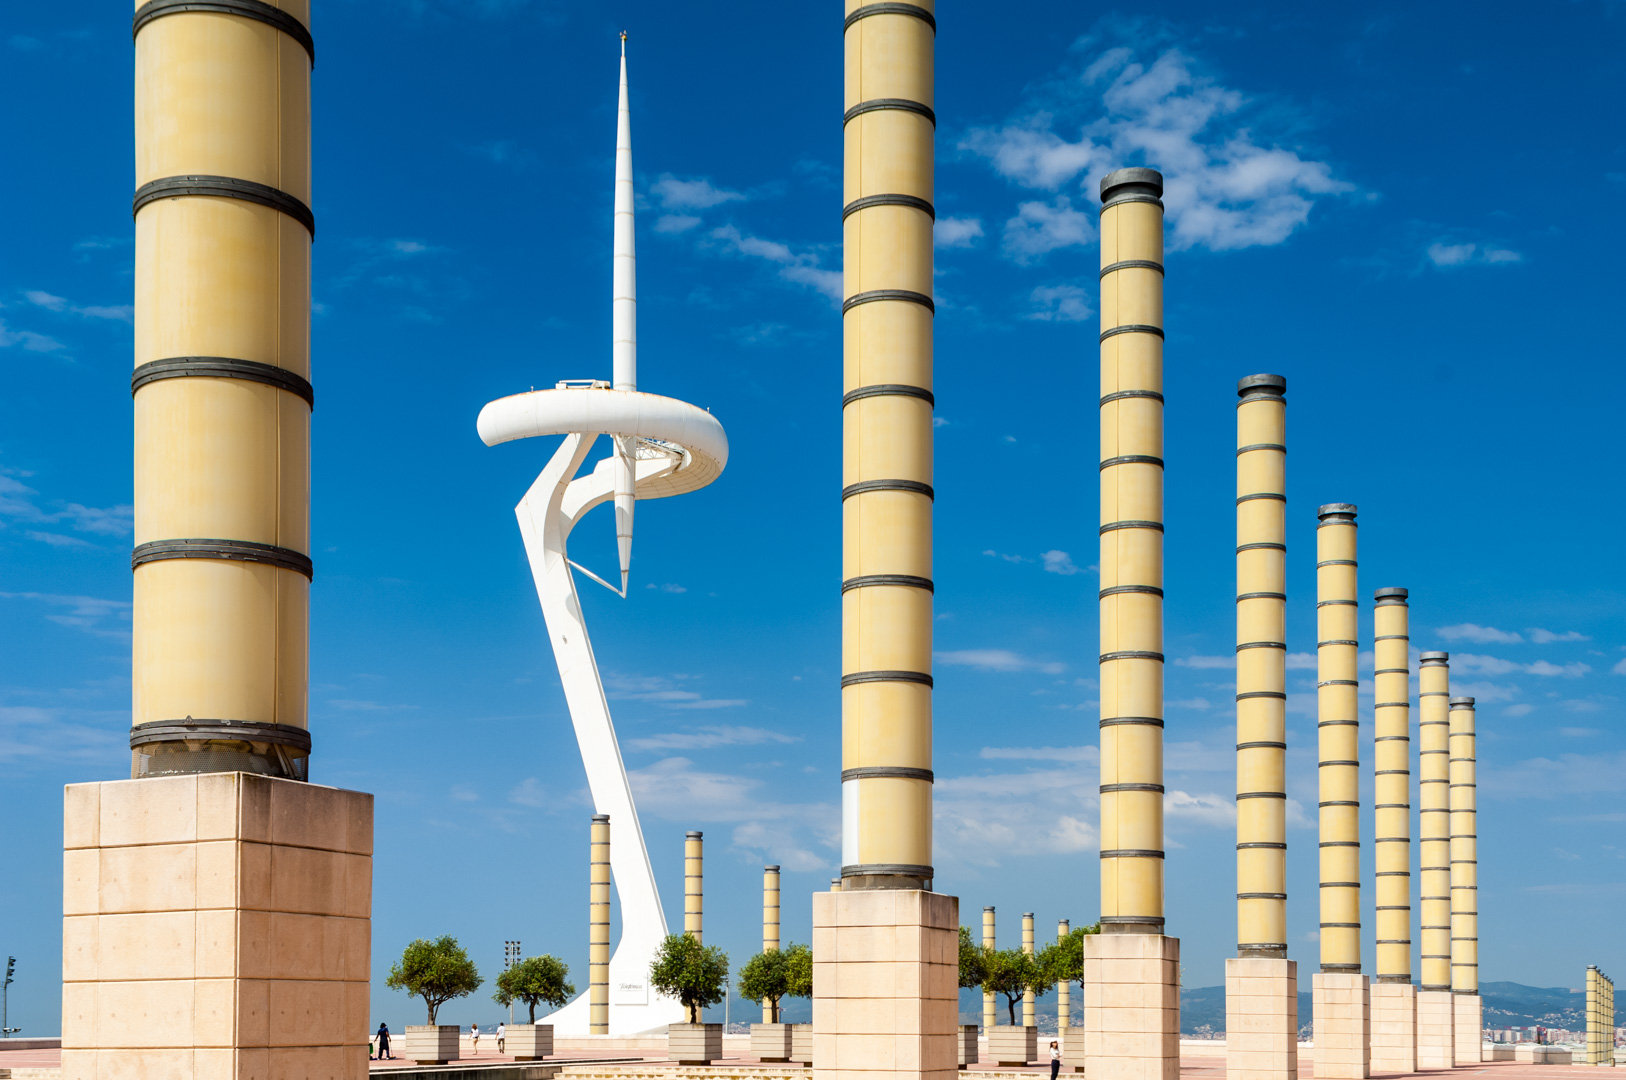 Barcelona auf dem Placa d'Europa zeigt die Skulptur Torre de comunicacions de Montjuic Olympischen Sommerspiele Architekt Santiago Calatrava